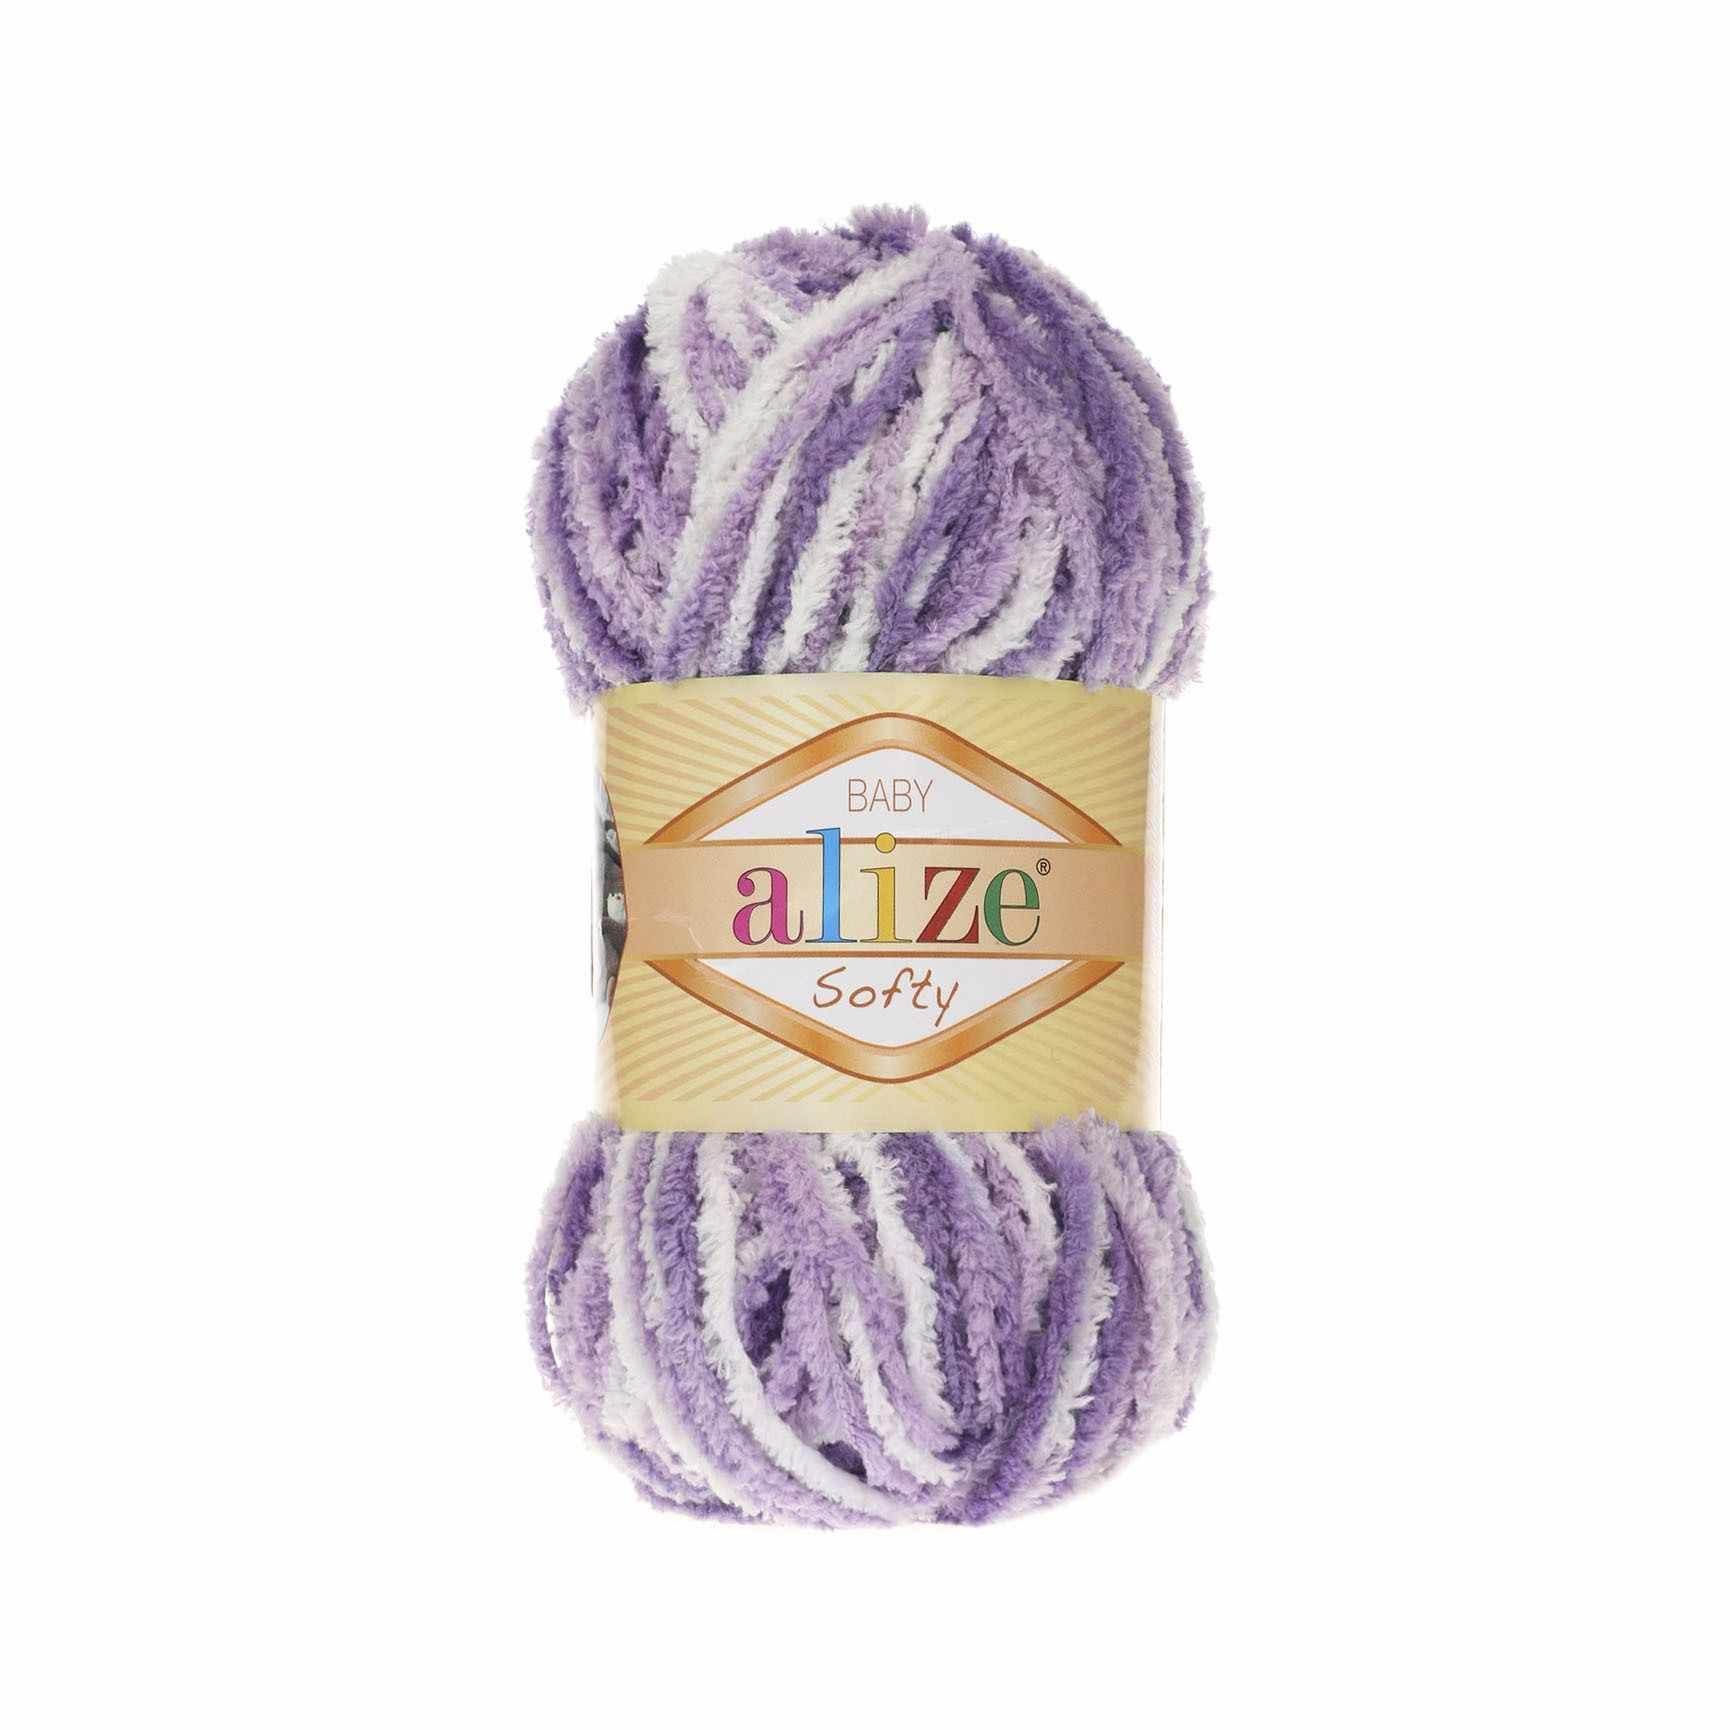 Пряжа Alize Softy Цвет.51627 Бело-сиреневый